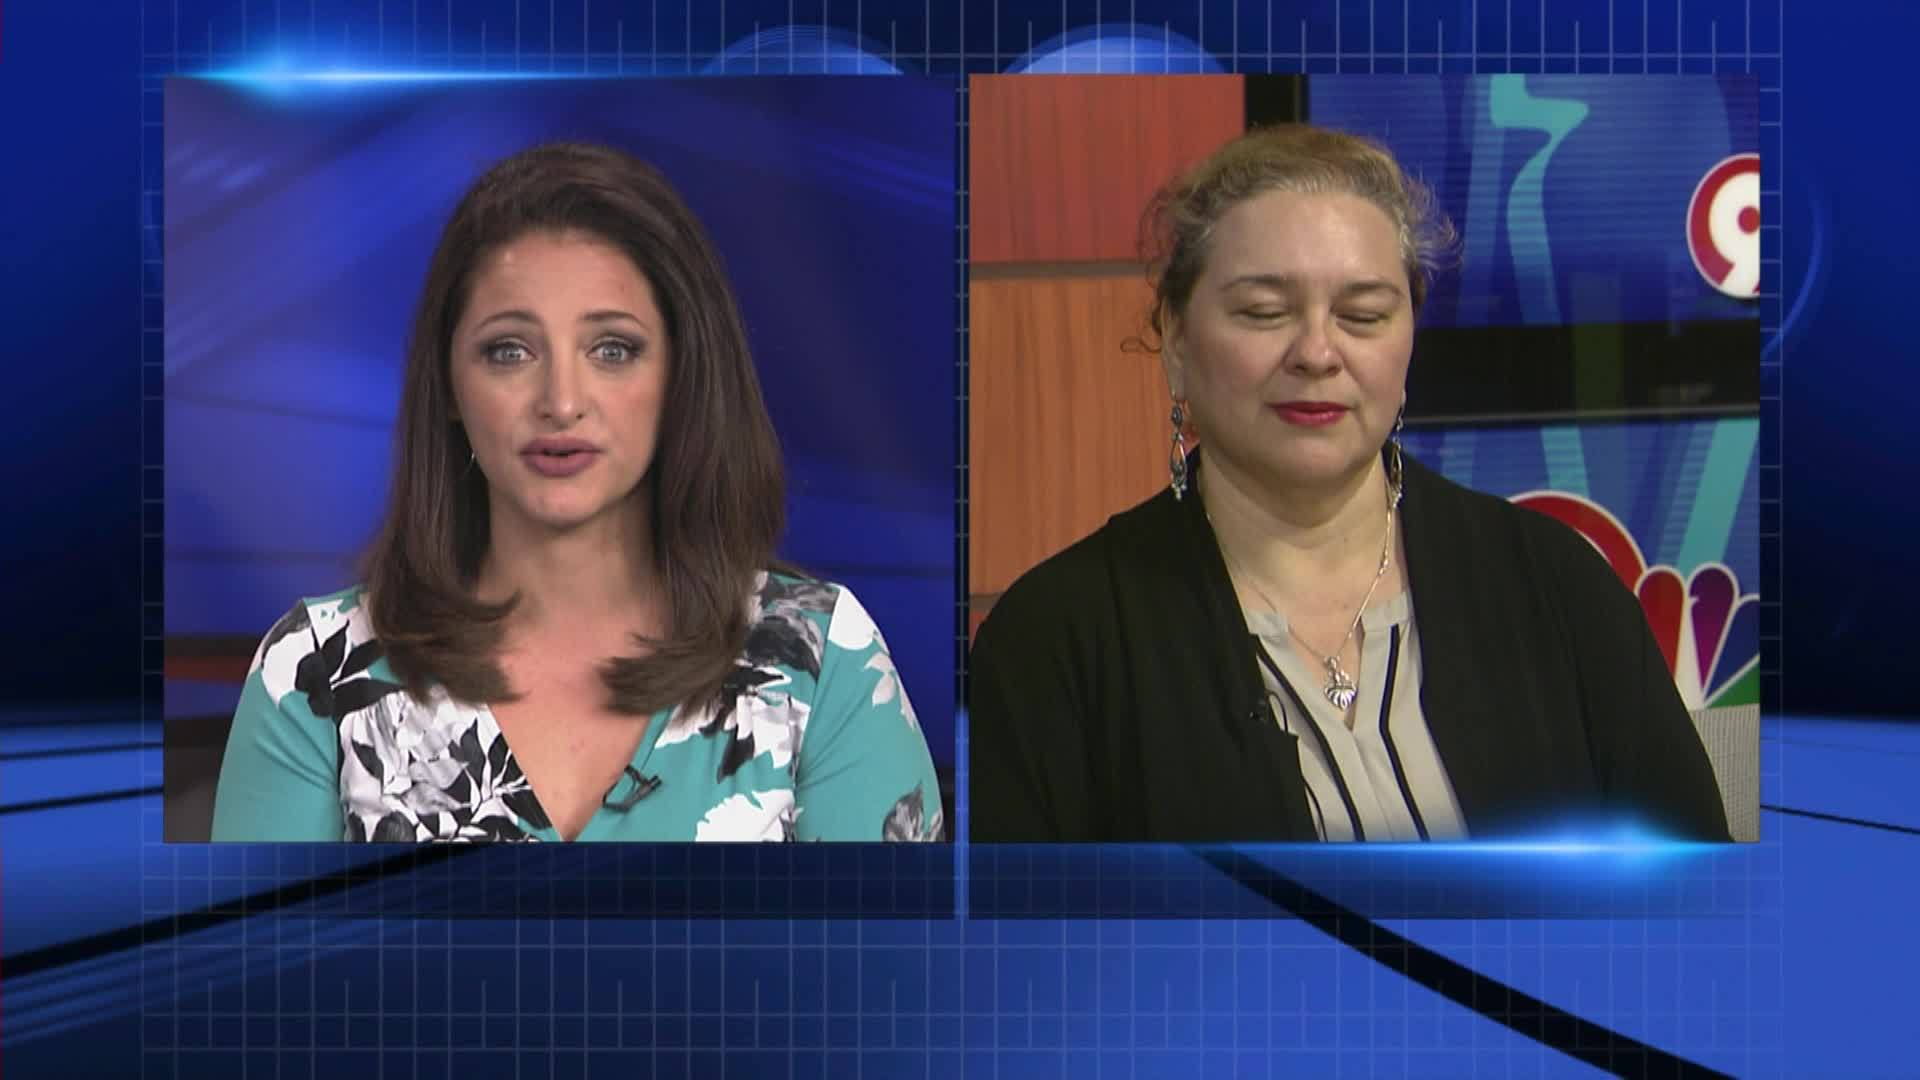 Full interview with Guillermina Gina Nunez-Mchiri